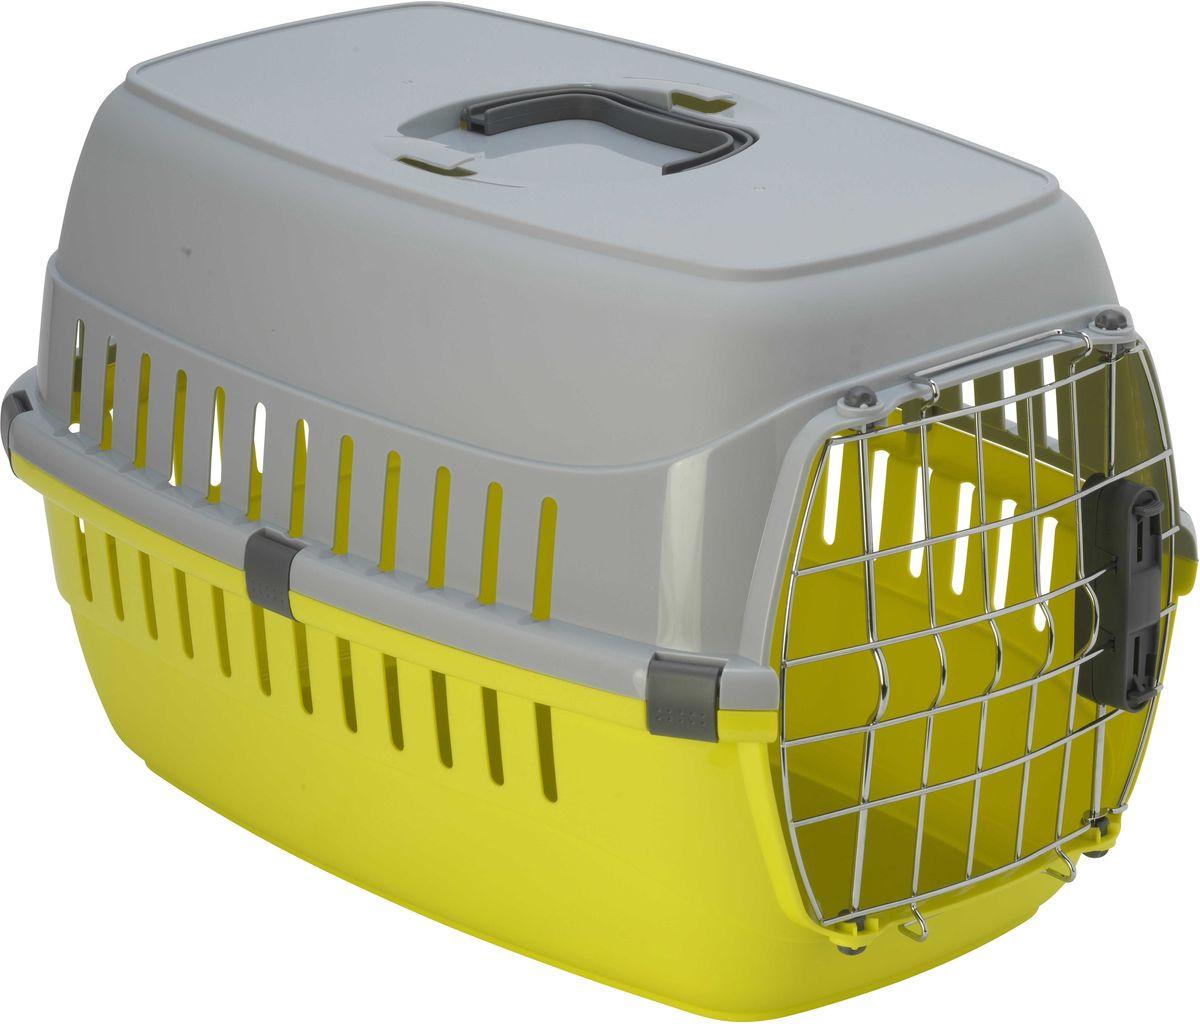 Переноска для авиаперевозок Moderna Roadrunner 2, цвет: лимон, 35 х 58 х 37 см переноска для животных moderna roadrunner 1 для авиаперевозок замок iata цвет ярко розовый 31 х 51 х 34 см